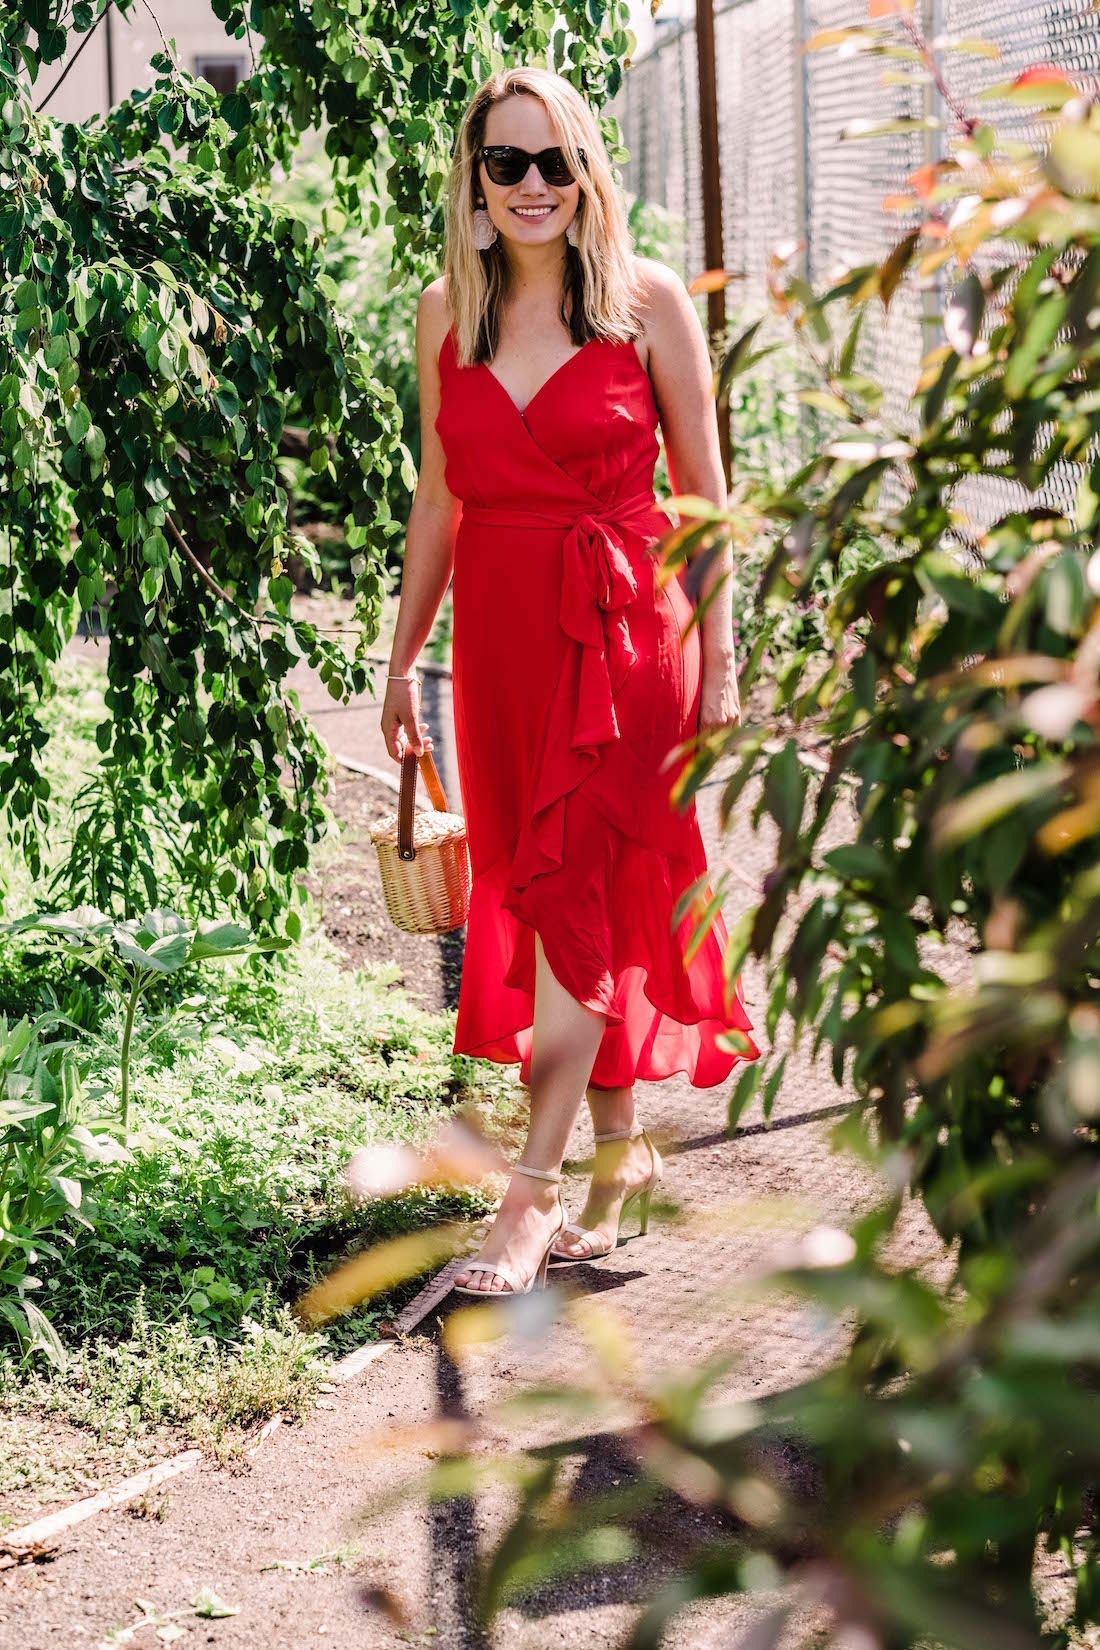 Emoji Dress - j.crew red wrap dress featured - The Stripe